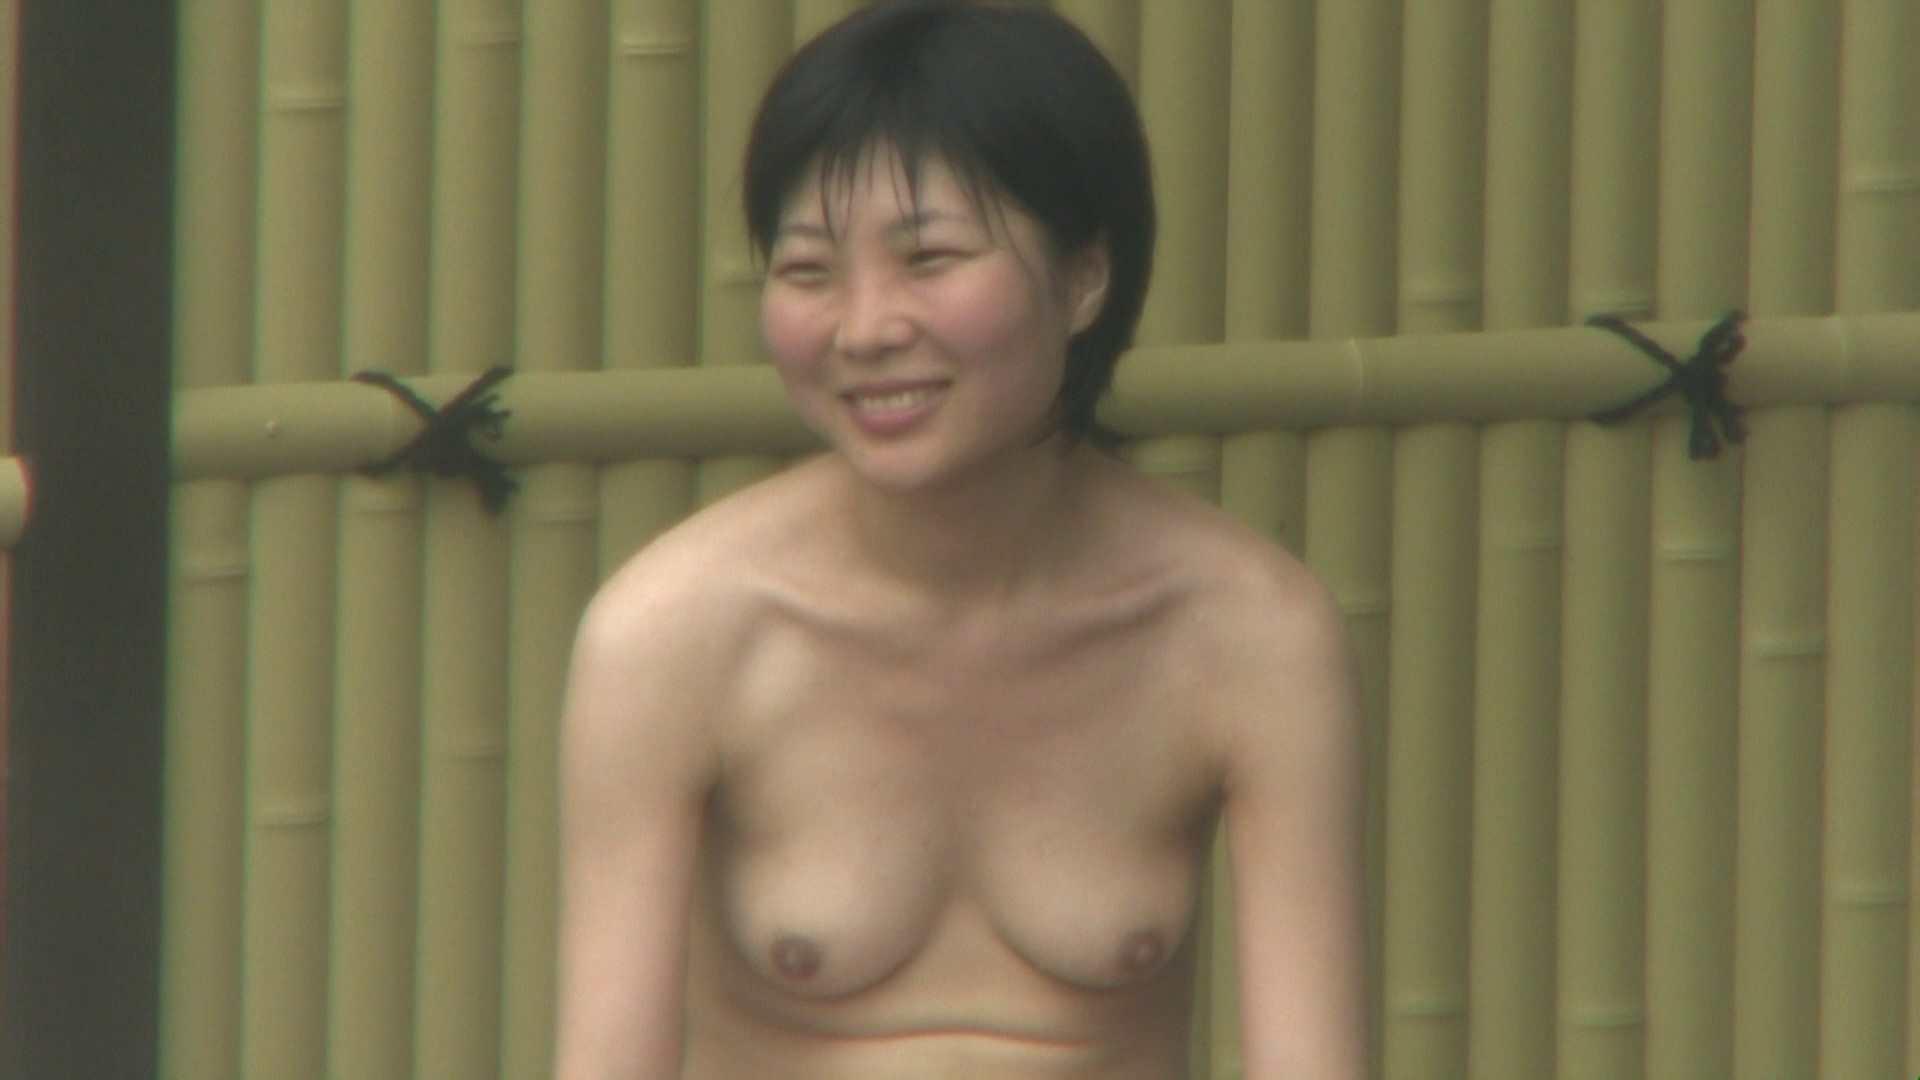 Aquaな露天風呂Vol.74【VIP限定】 綺麗なOLたち われめAV動画紹介 79枚 23